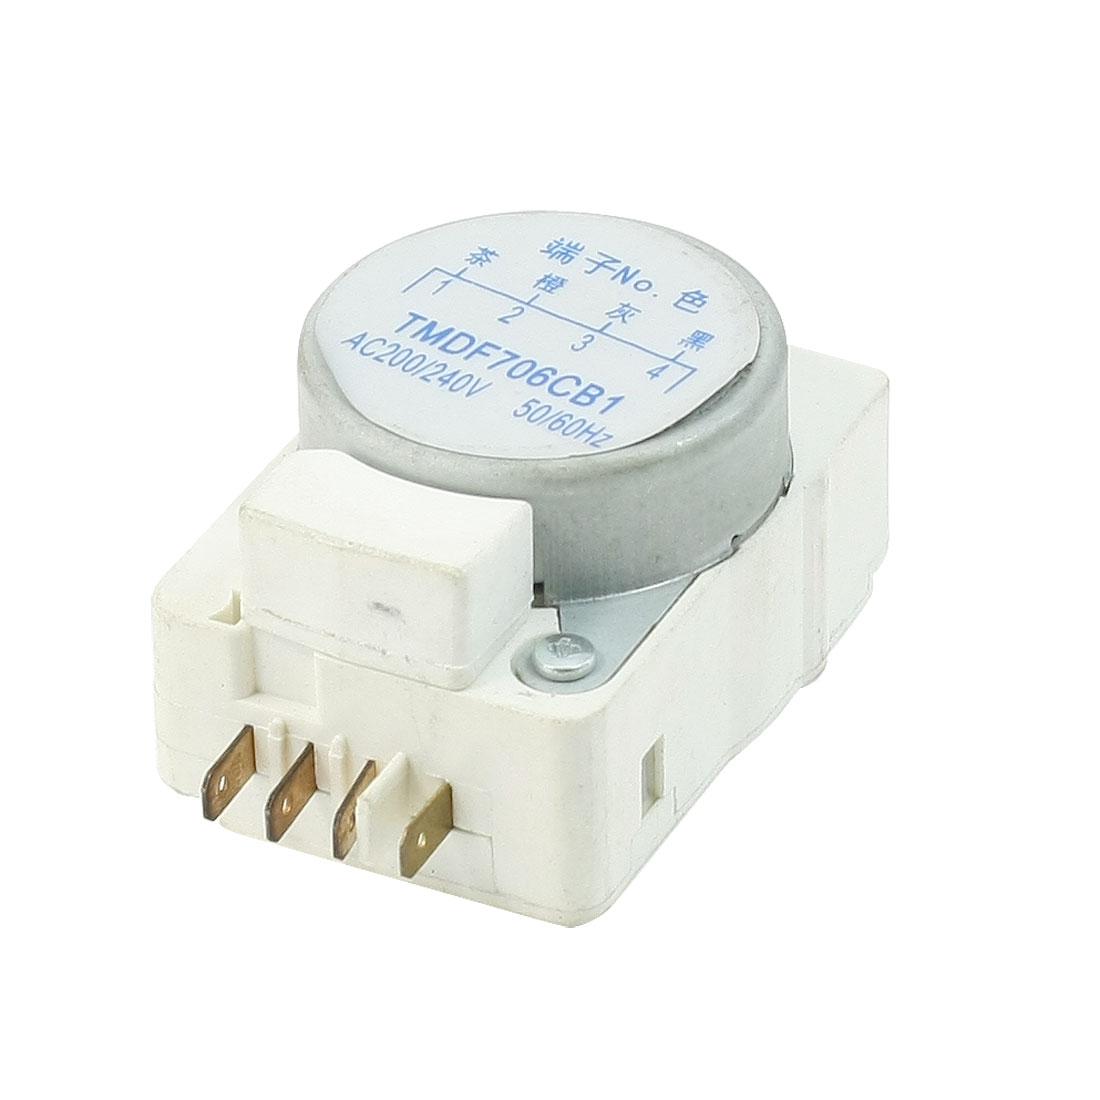 AC 200/240V 50/60Hz 4 Terminals Refrigerator Defrost Timer TMDF706CB1